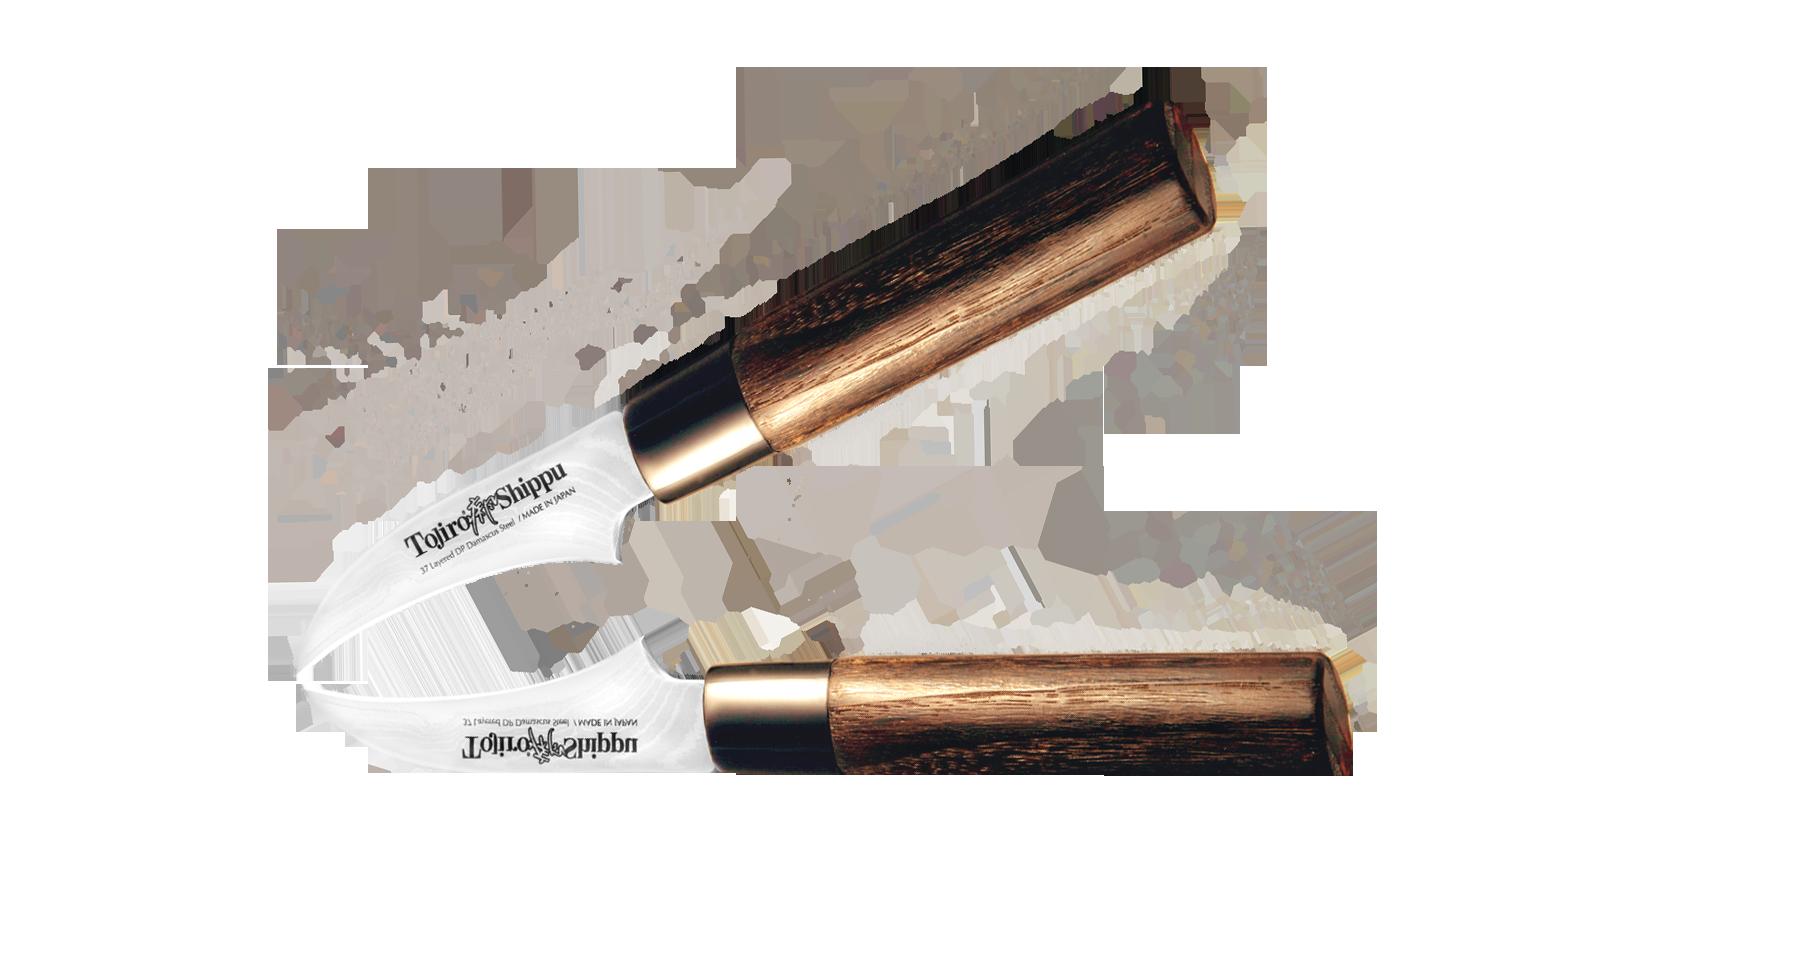 Кухонный нож для чистки овощей, Shippu, Tojiro, FD-590, сталь VG-10, в картонной коробке